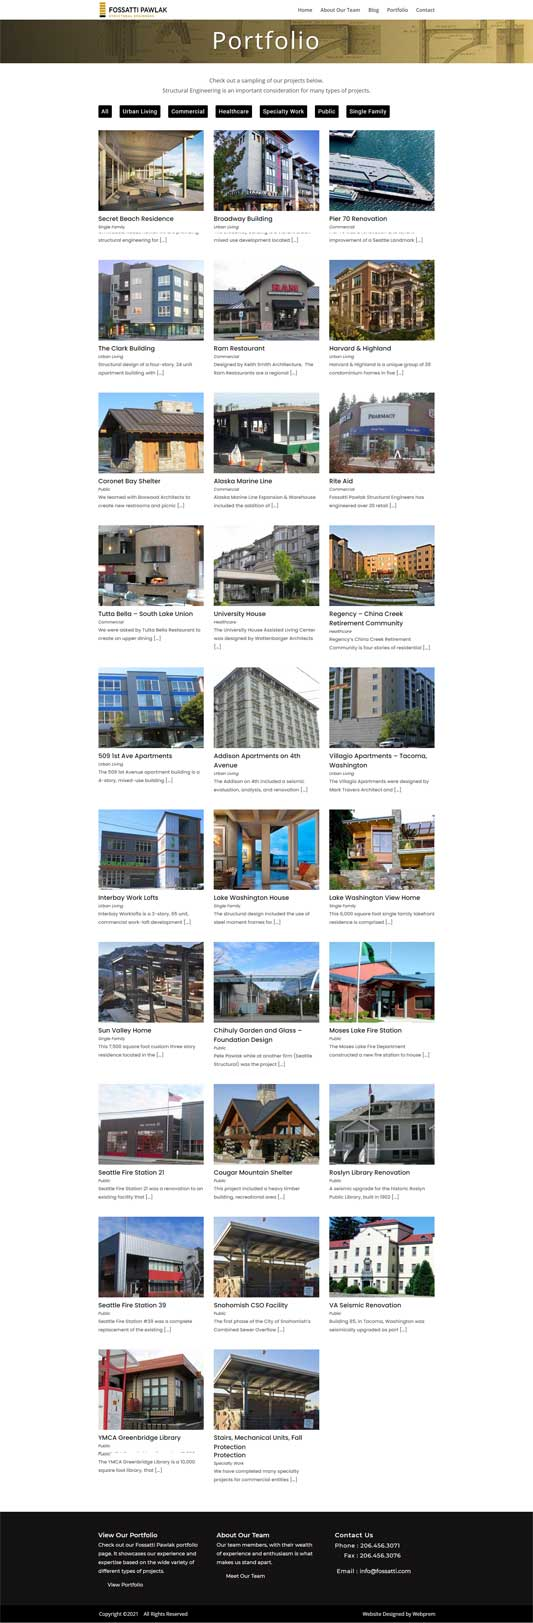 Fossatti Pawlak Seattle Structural Engineers Portfolio